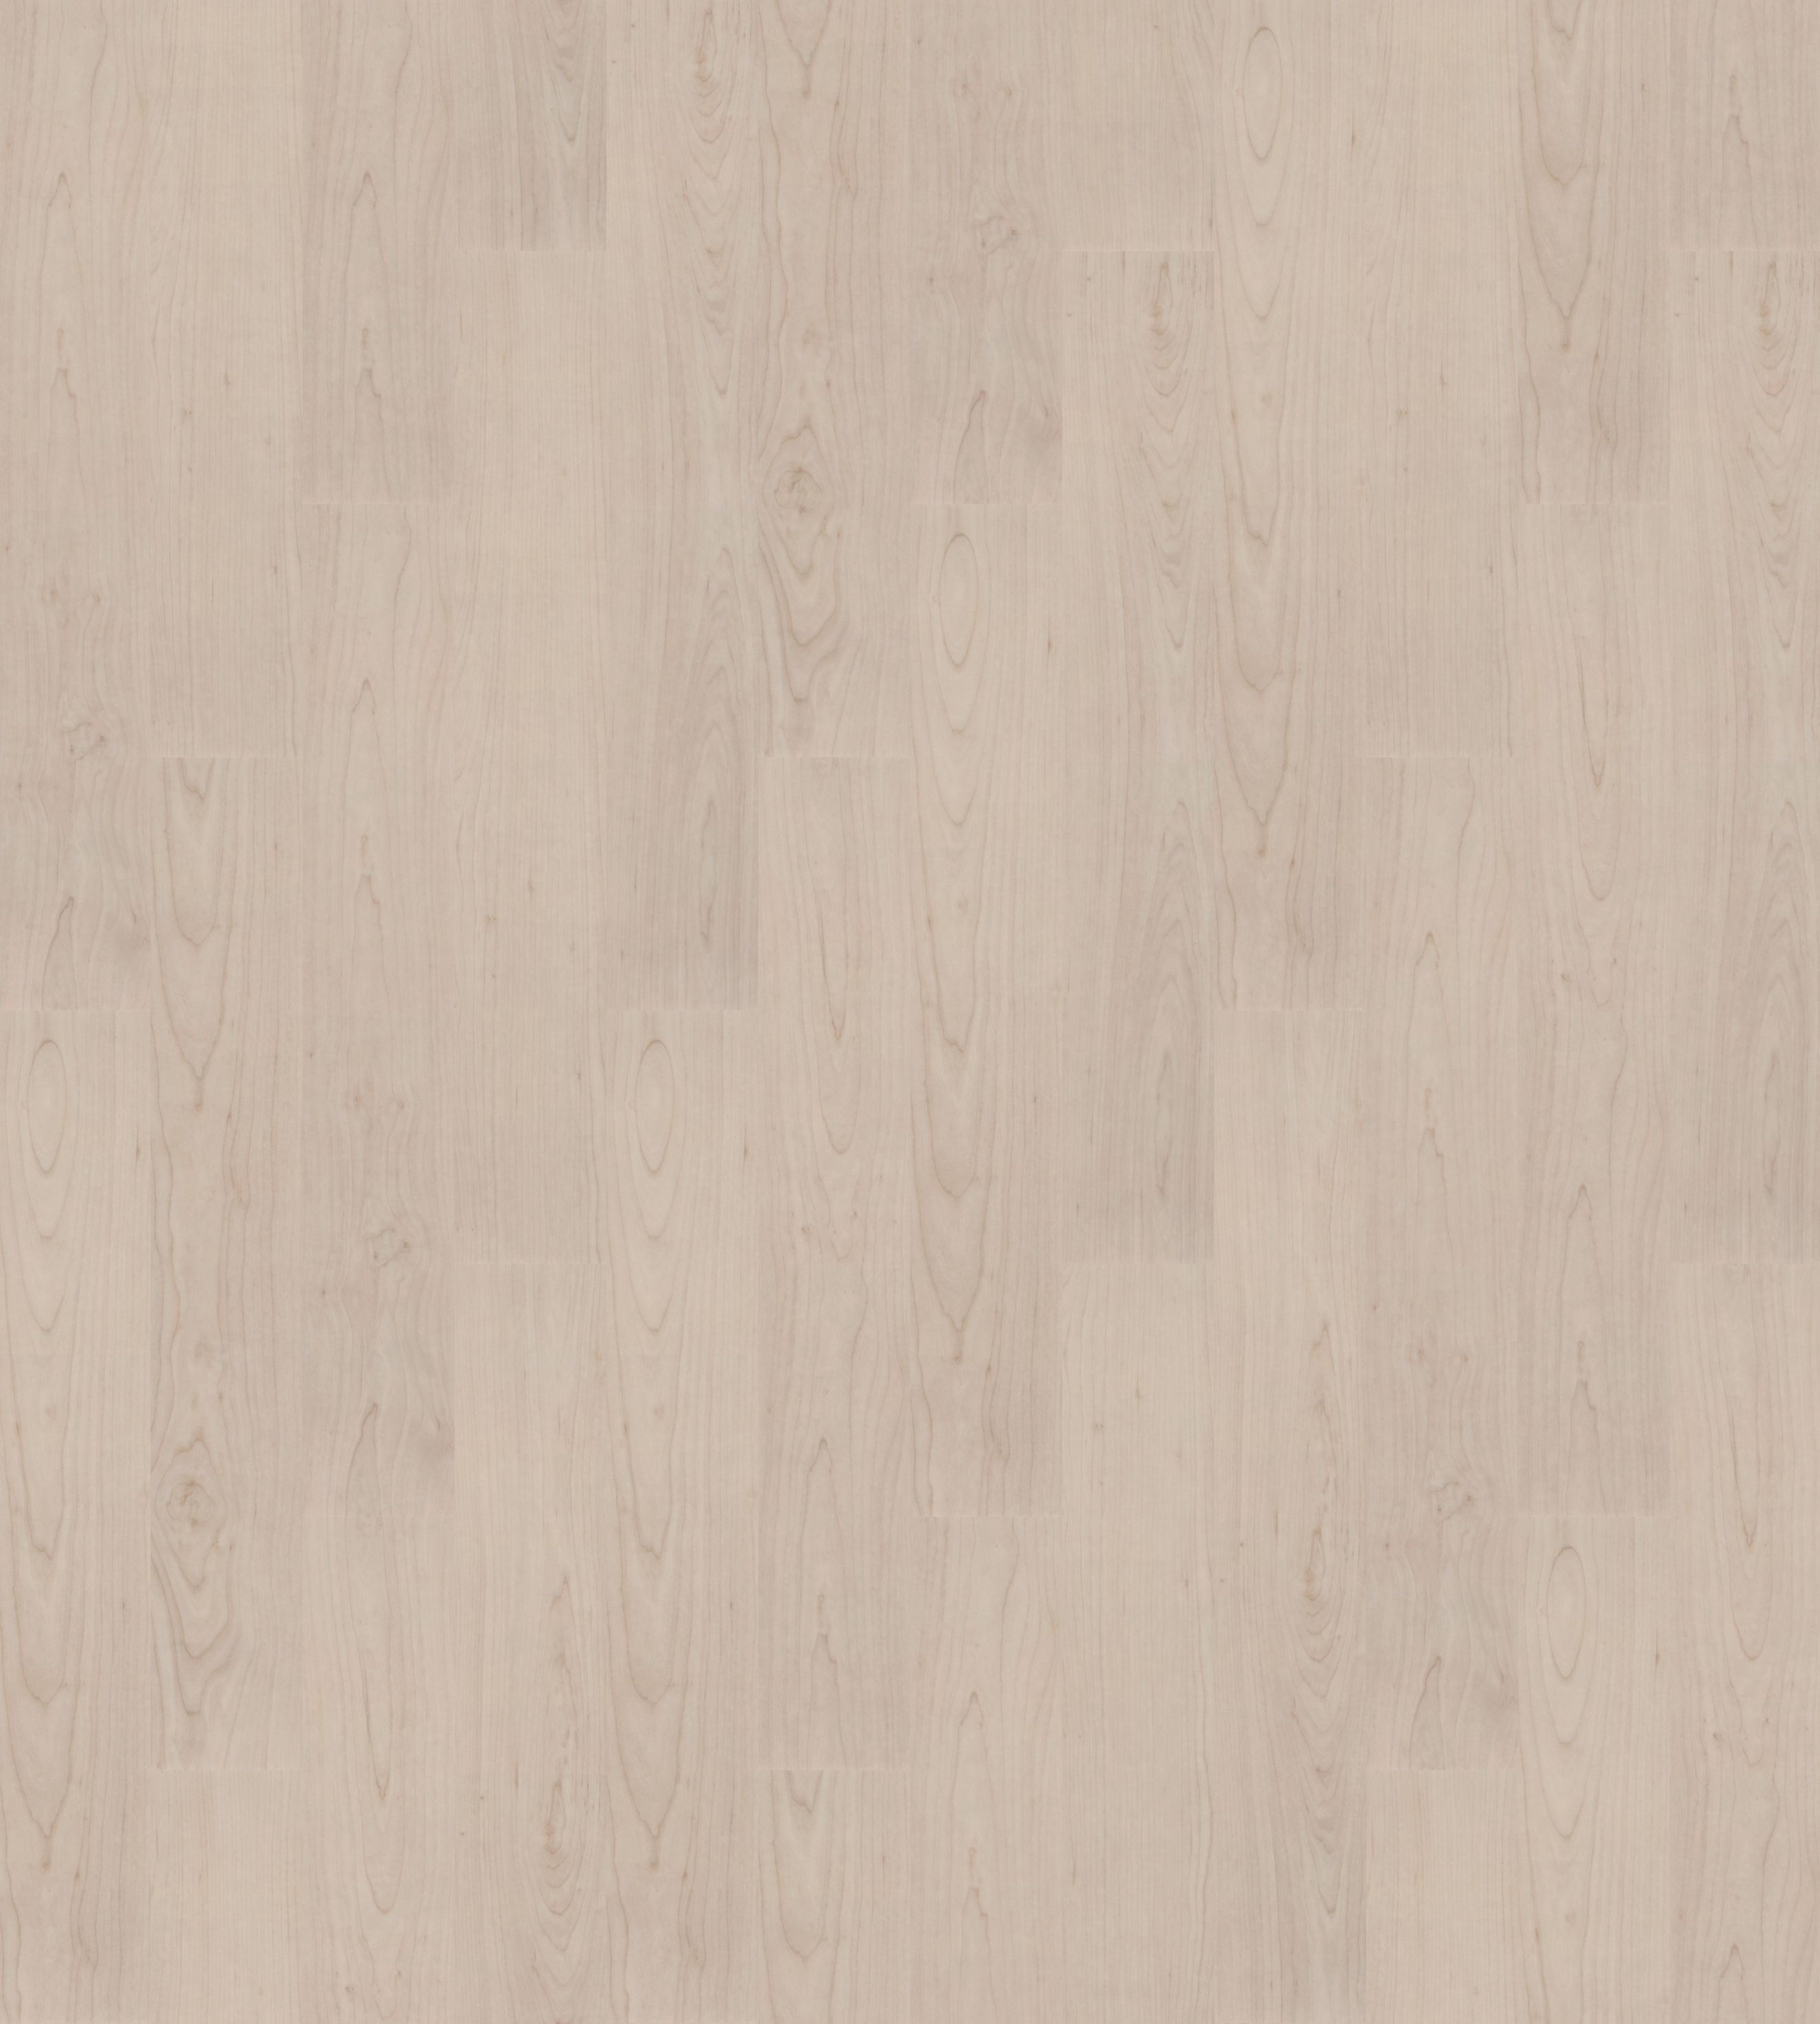 Allura wood forbo flooring systems